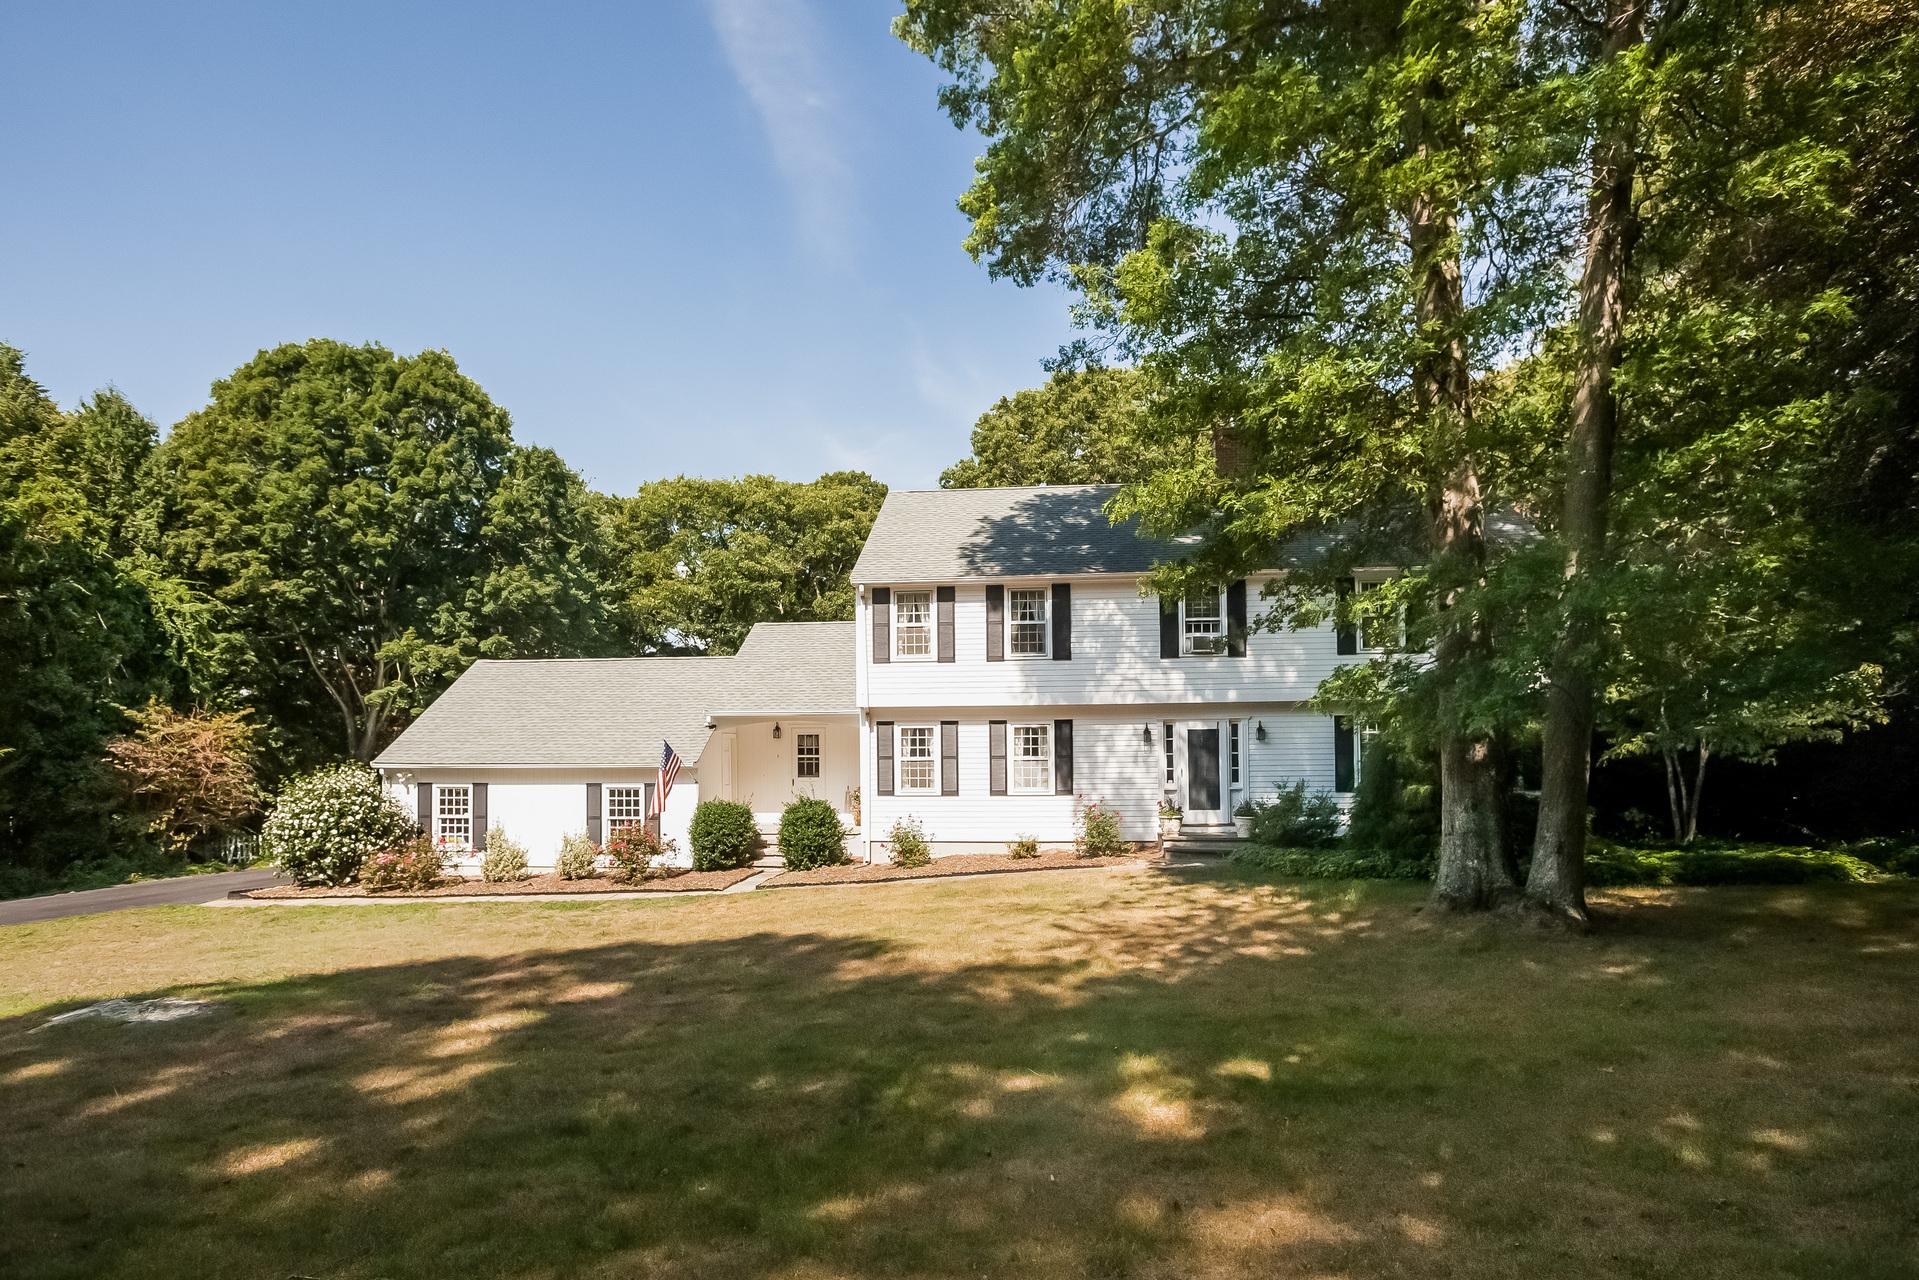 Property For Sale at 17 Forest Hills Dr